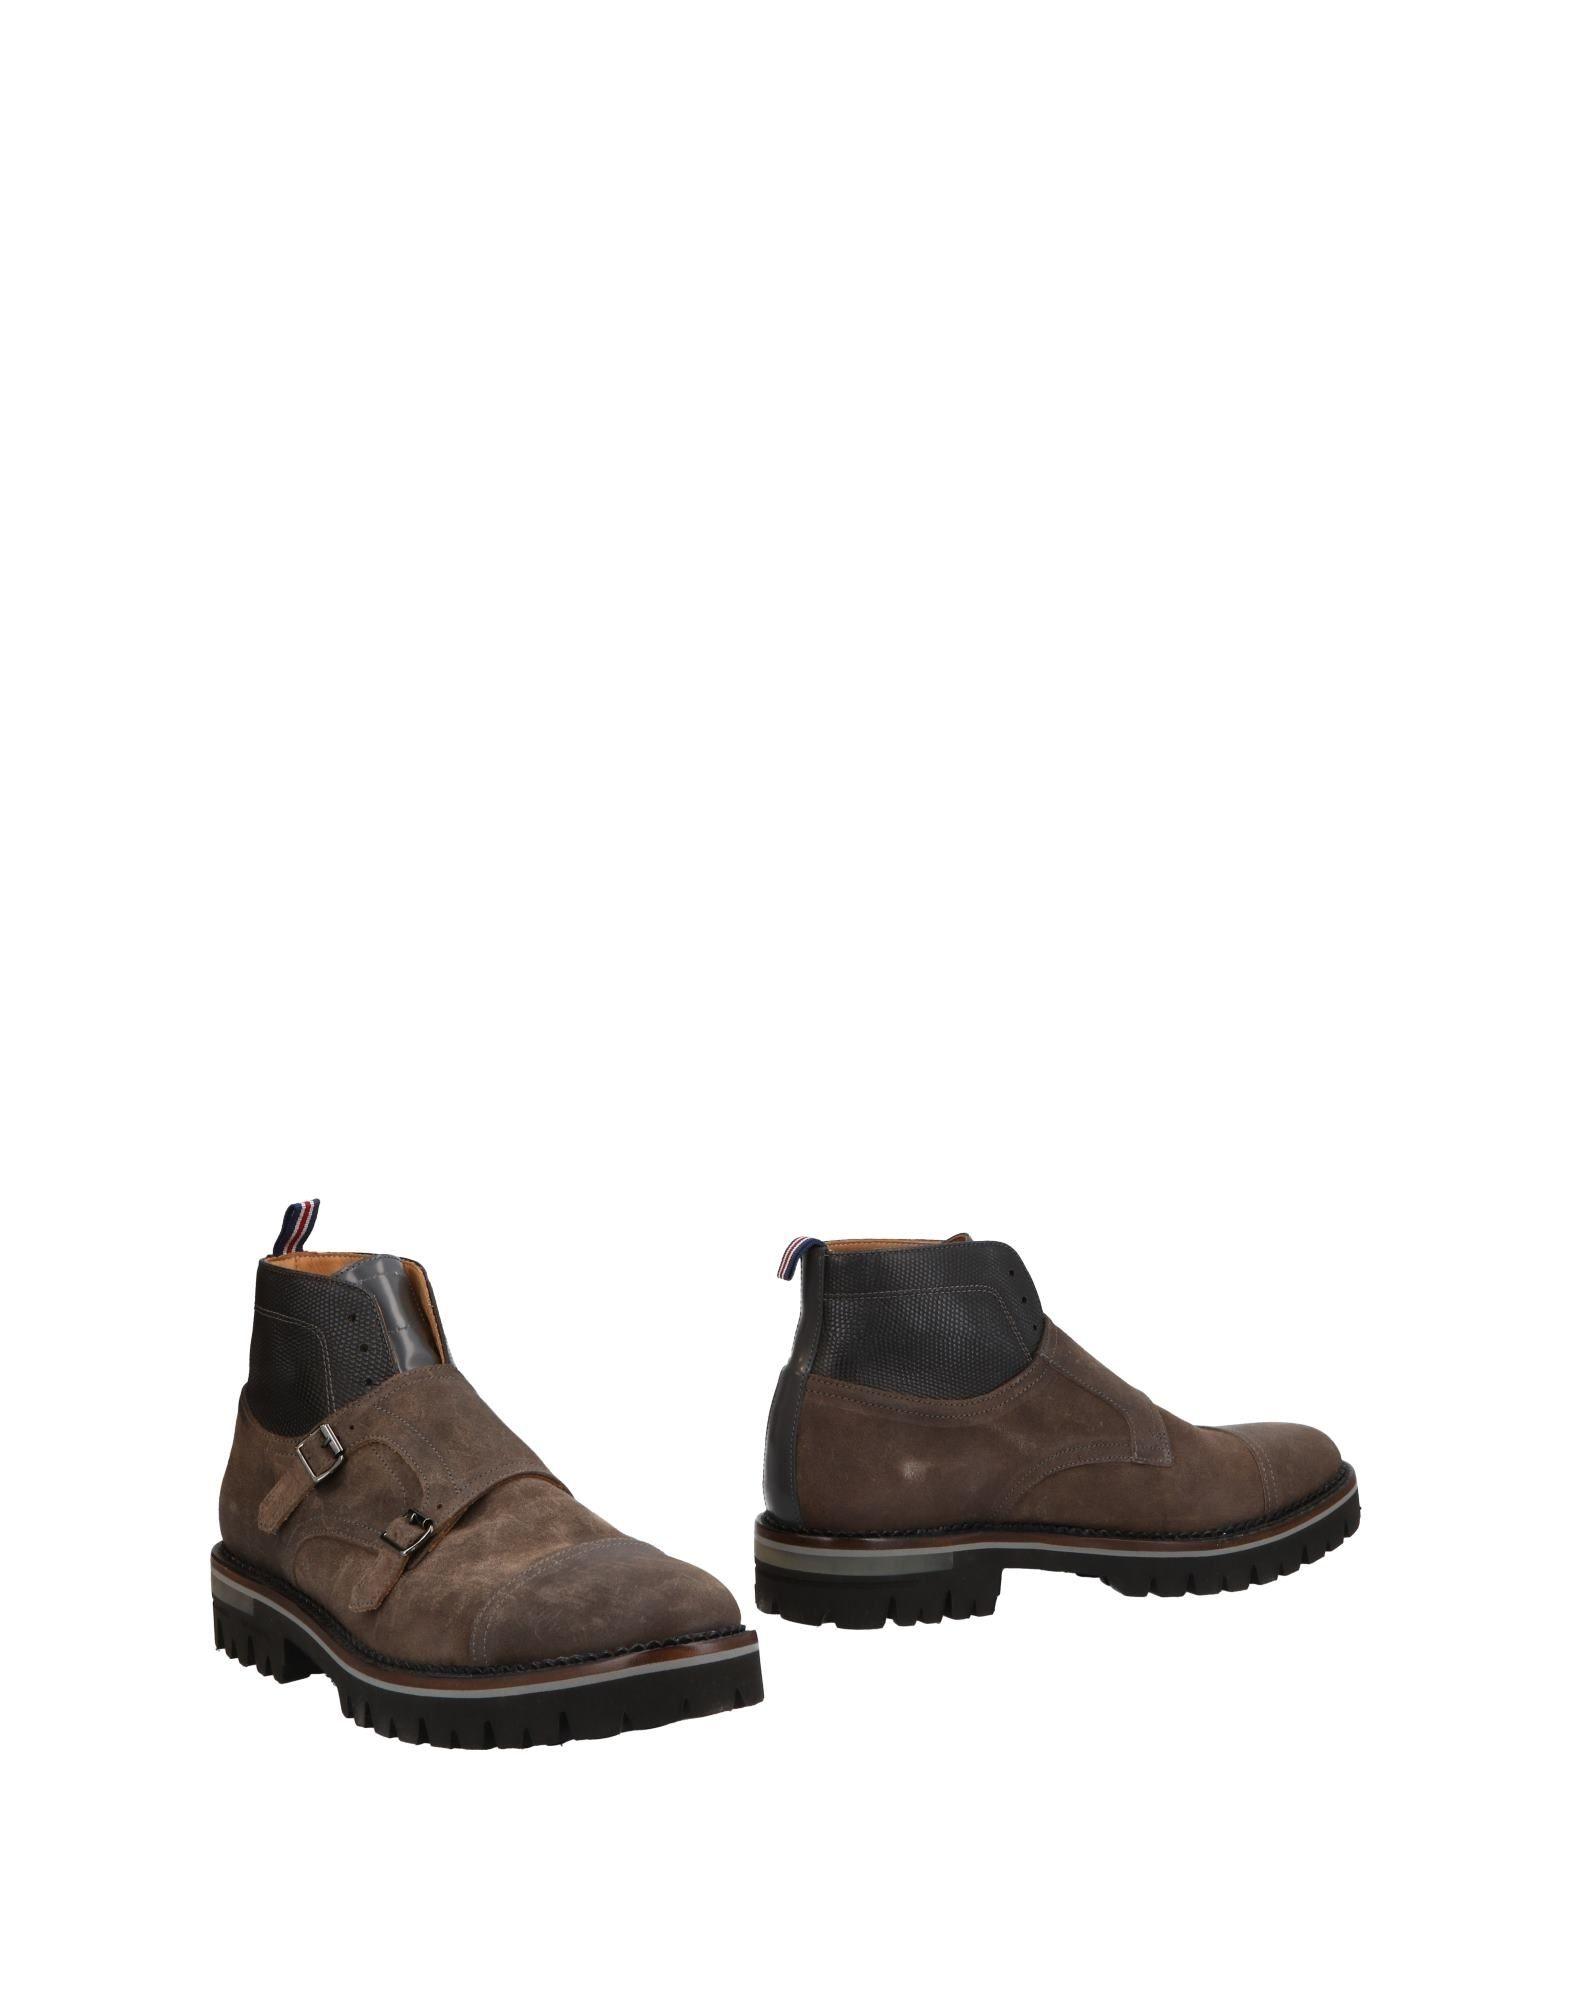 Rabatt echte  Schuhe Brimarts Stiefelette Herren  echte 11296760QF 7e3a3b